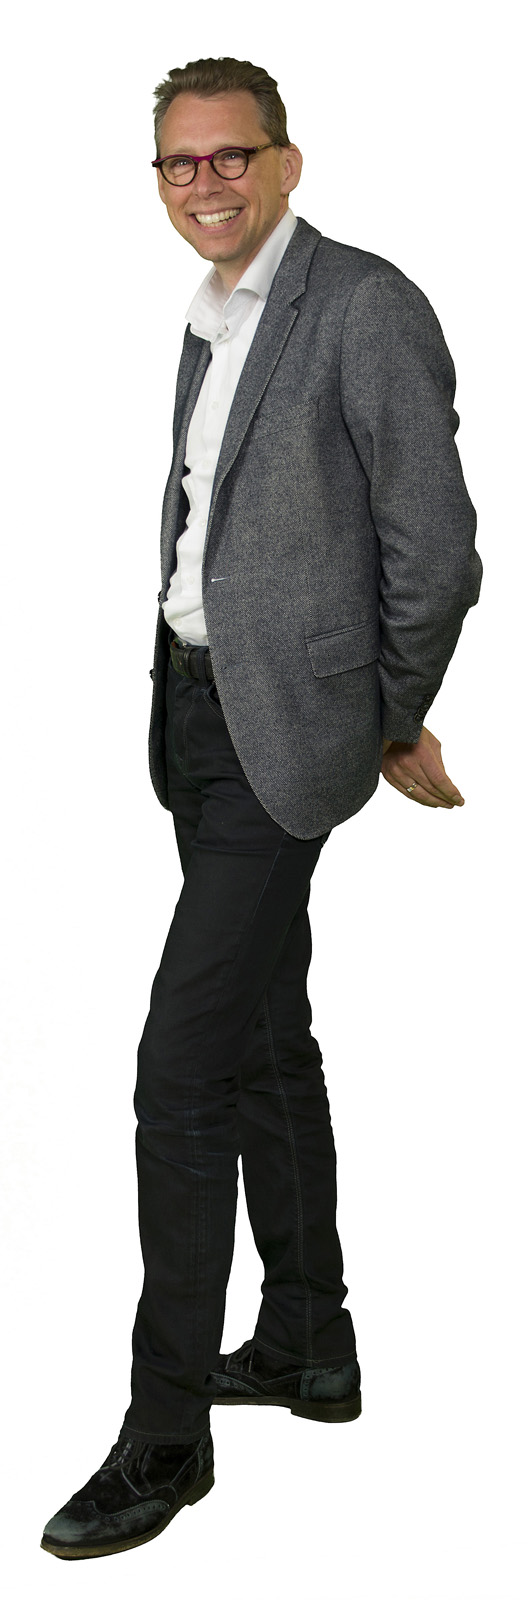 ing. J.G. (John) Bouwman MBA